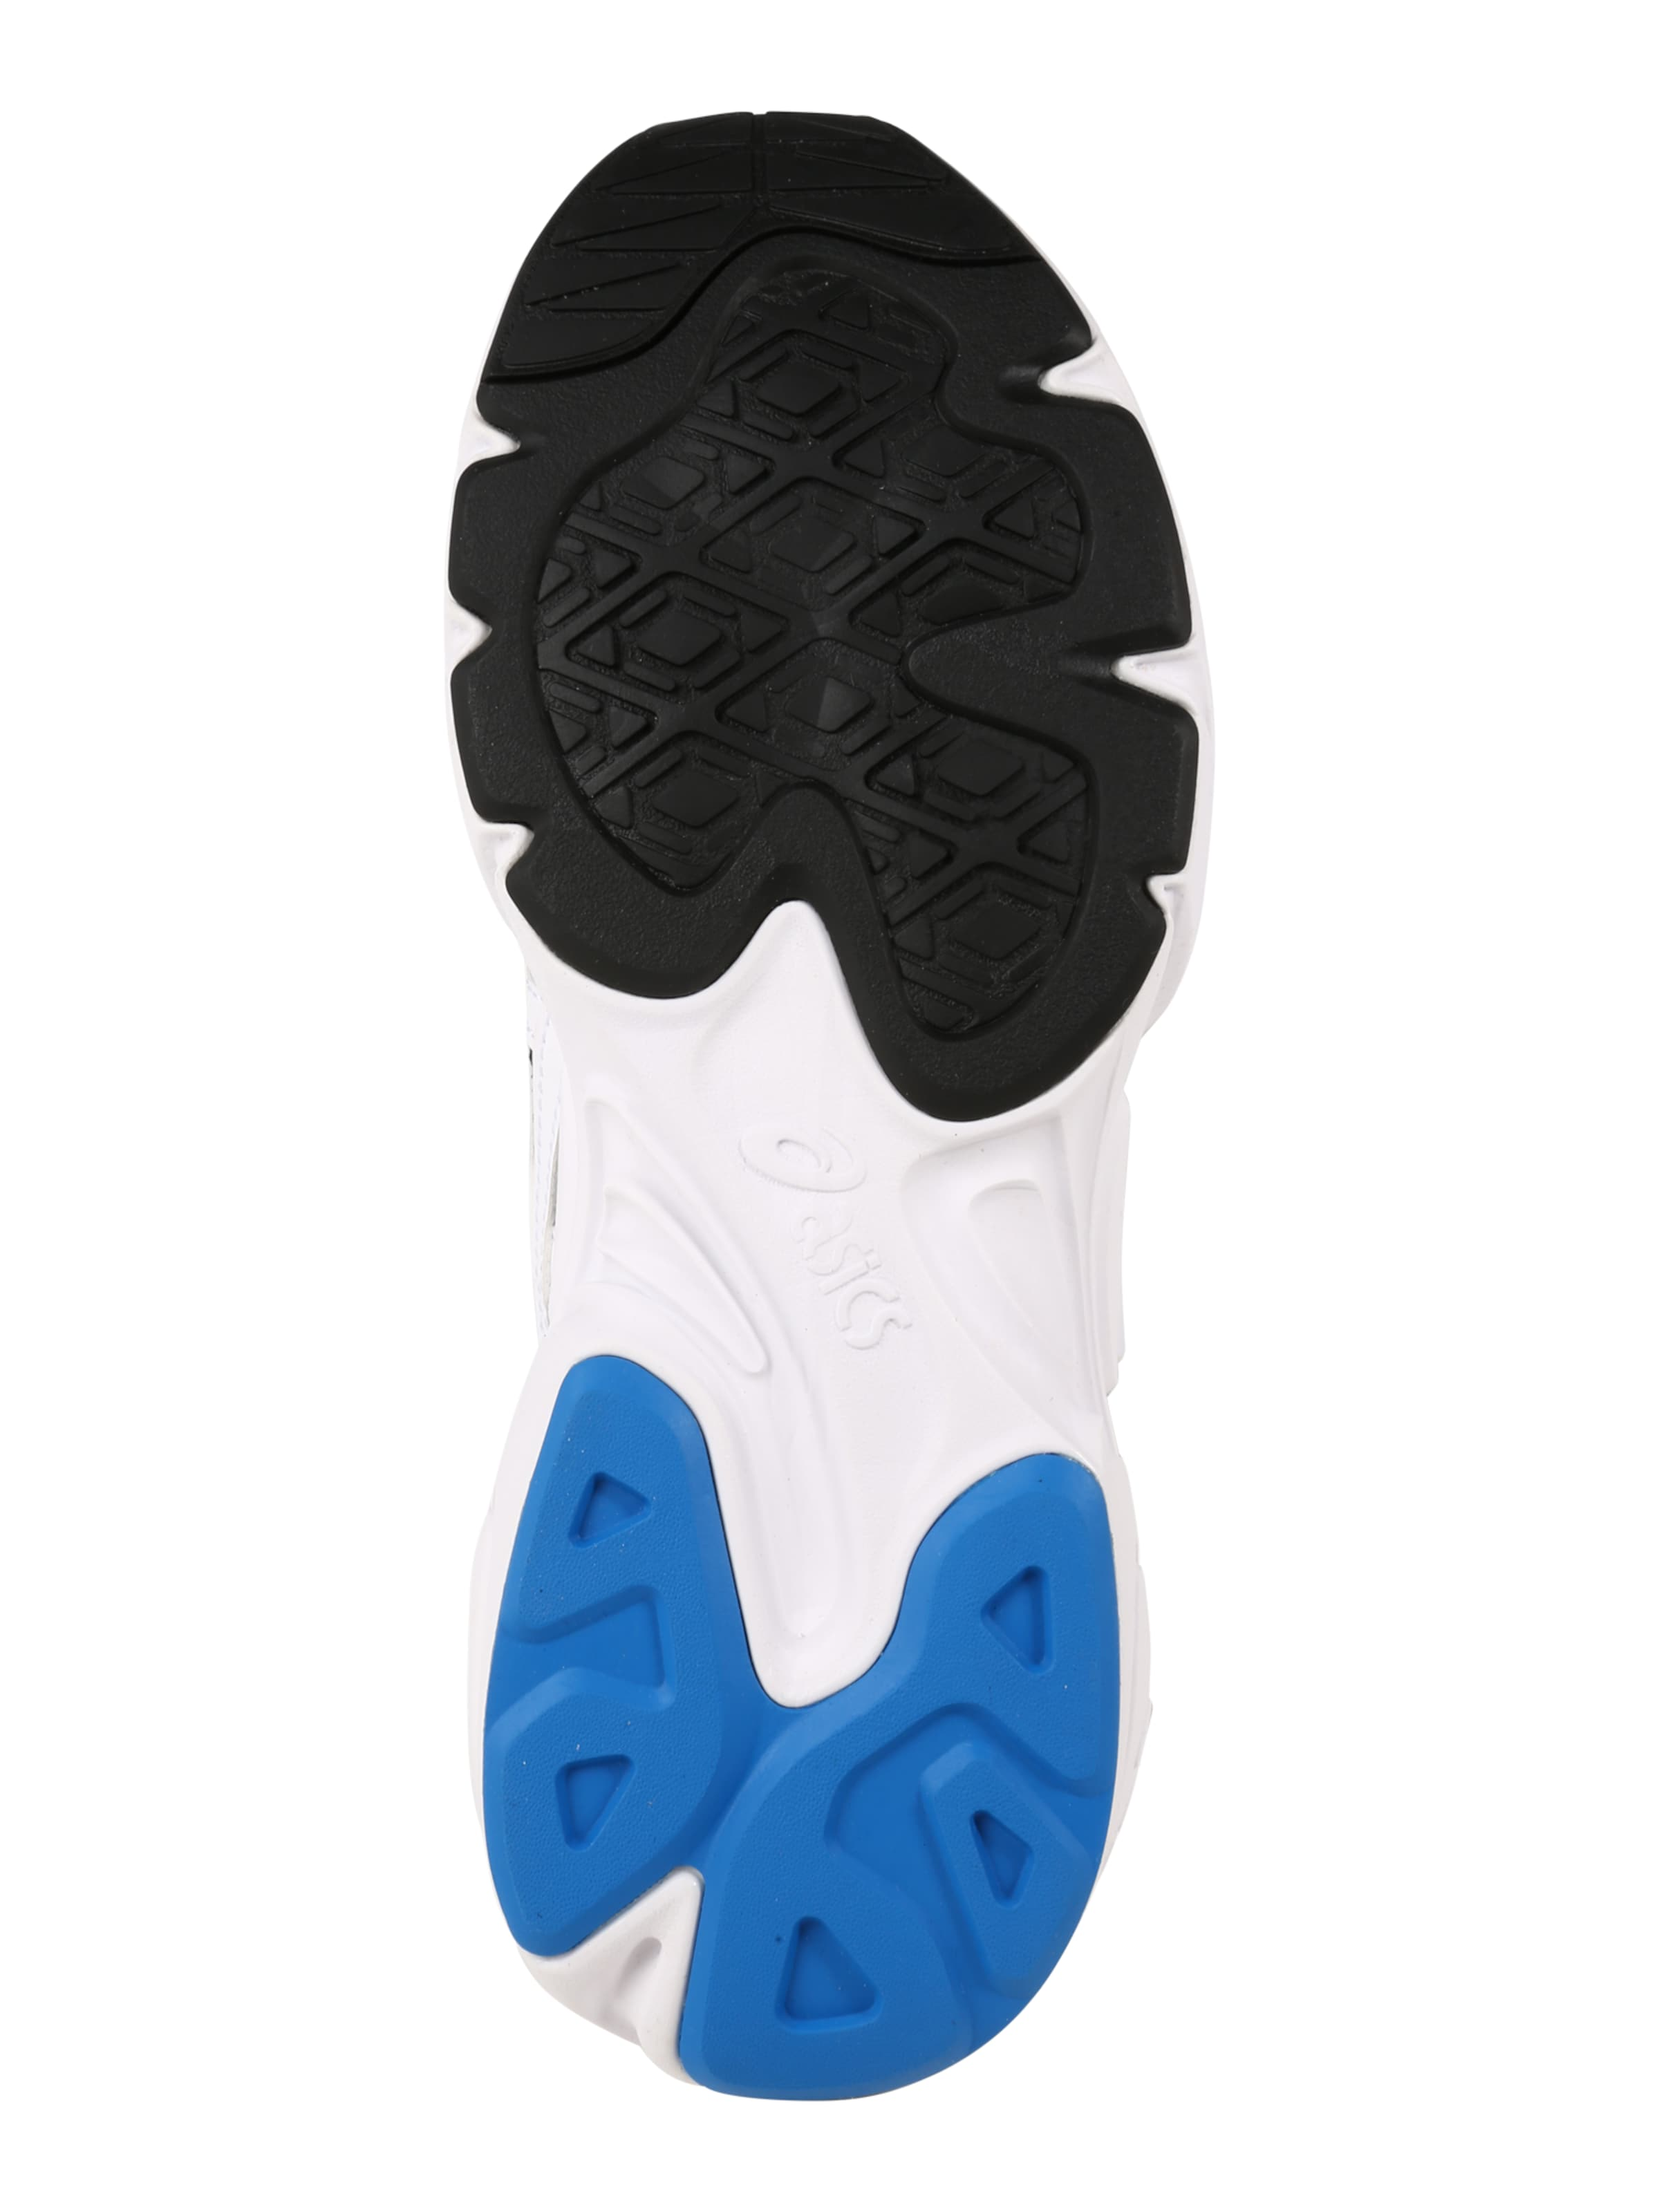 bnd In Gs' GrauSchwarz Asics Tiger Weiß Sneaker 'gel wOX8n0Pk